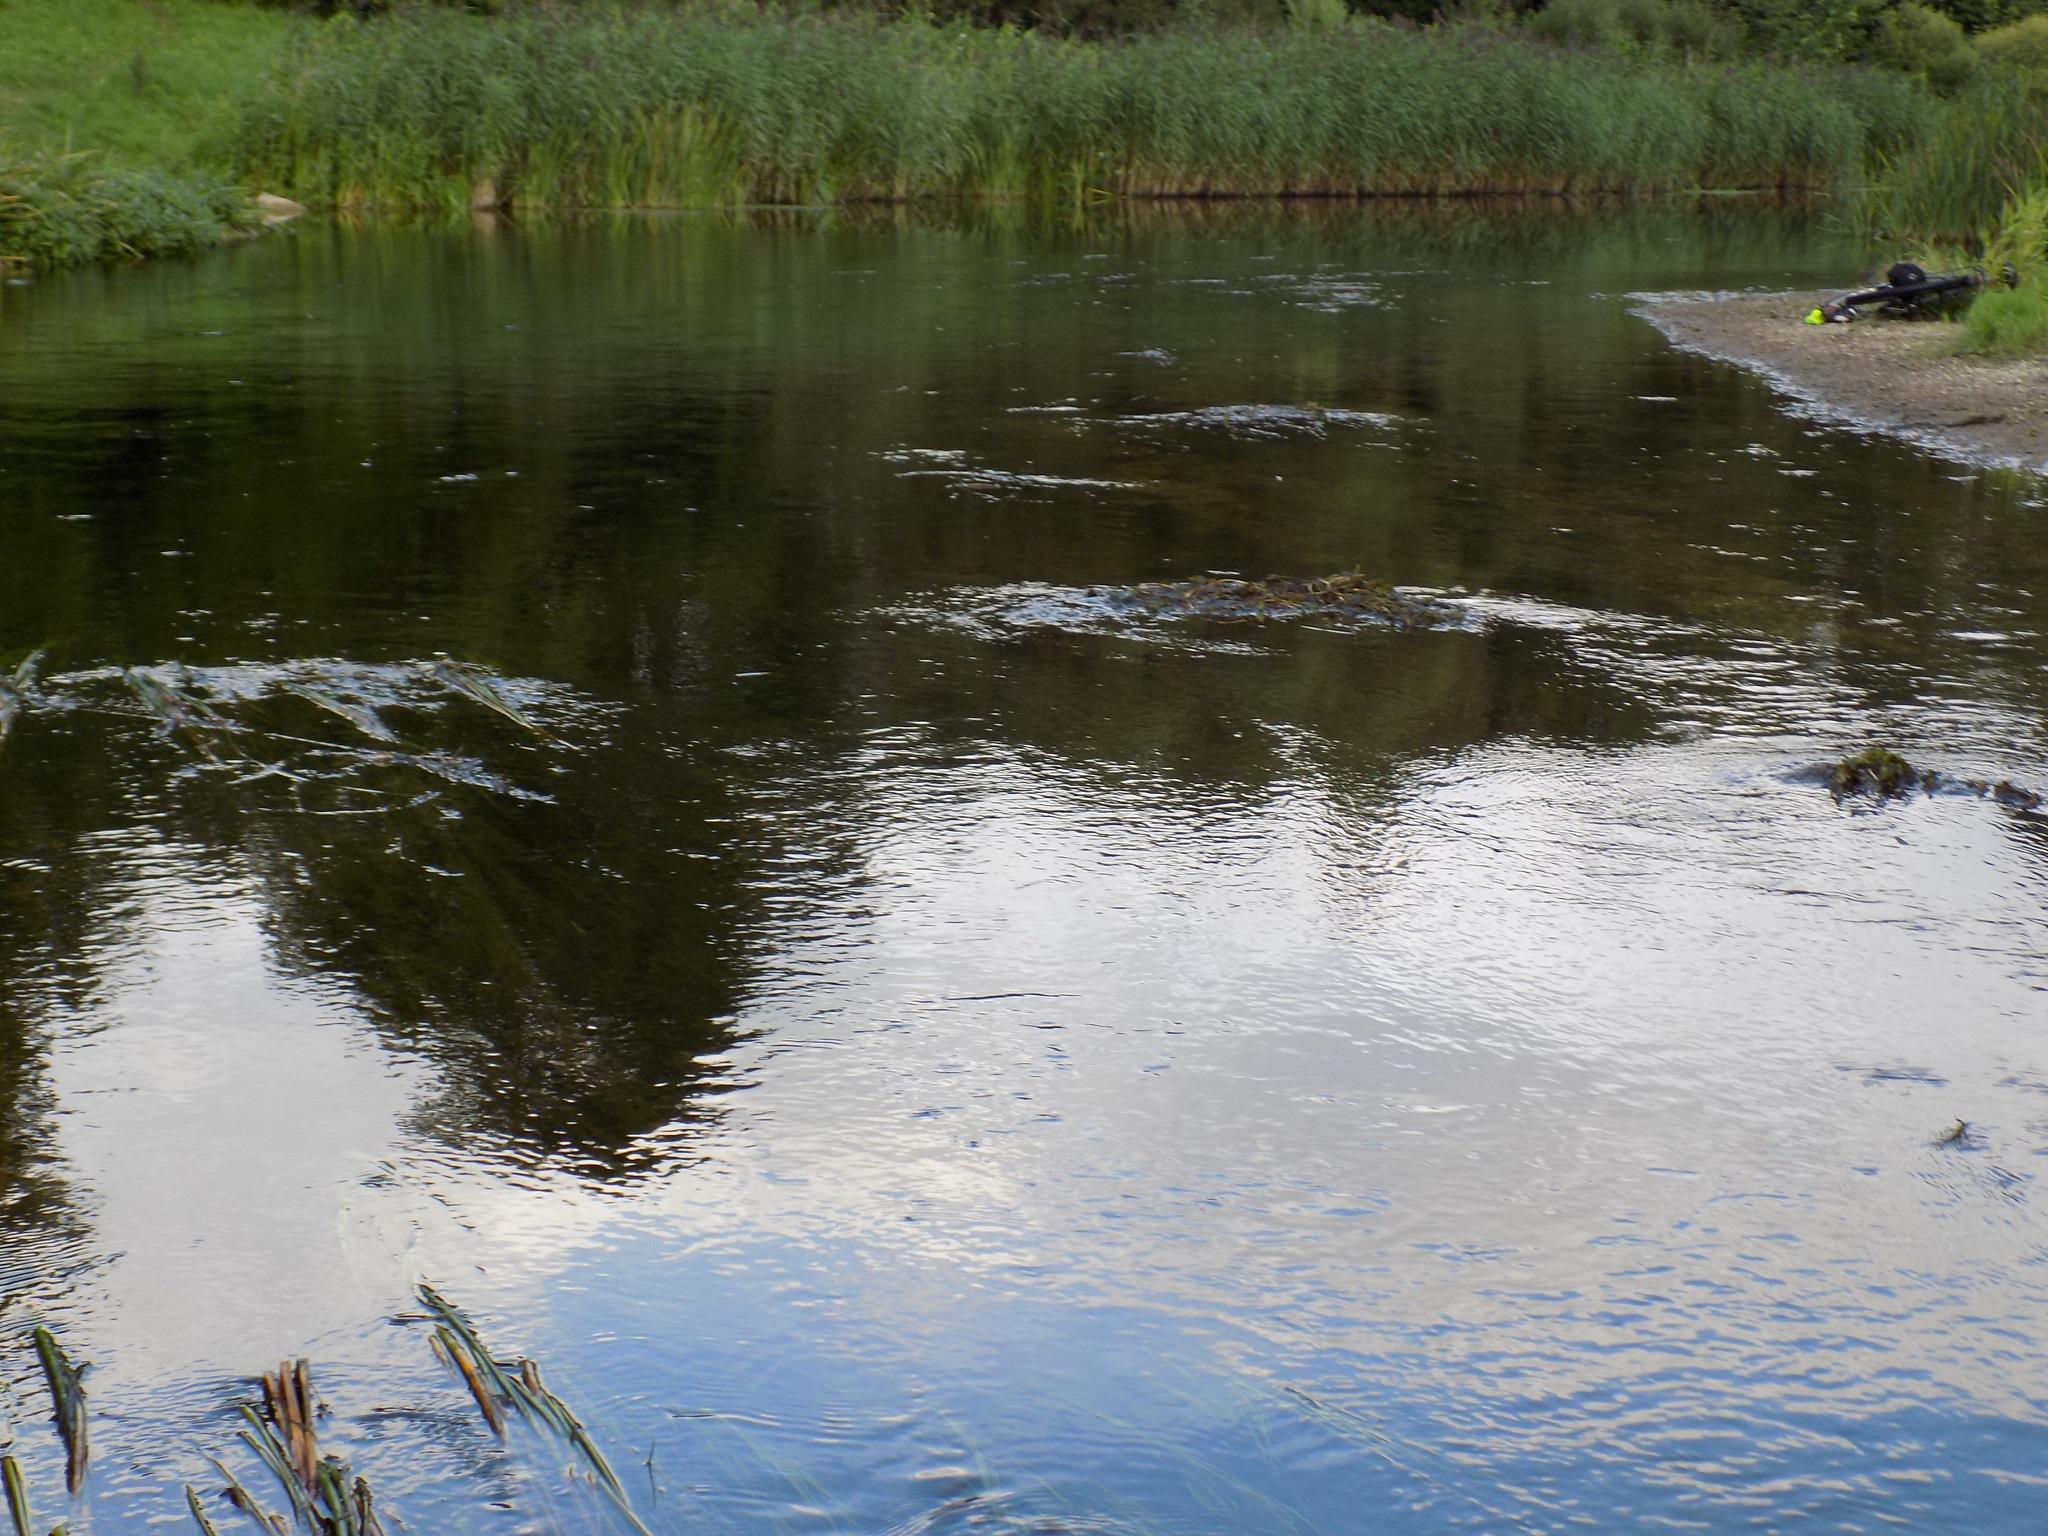 River by uzkuraitiene62